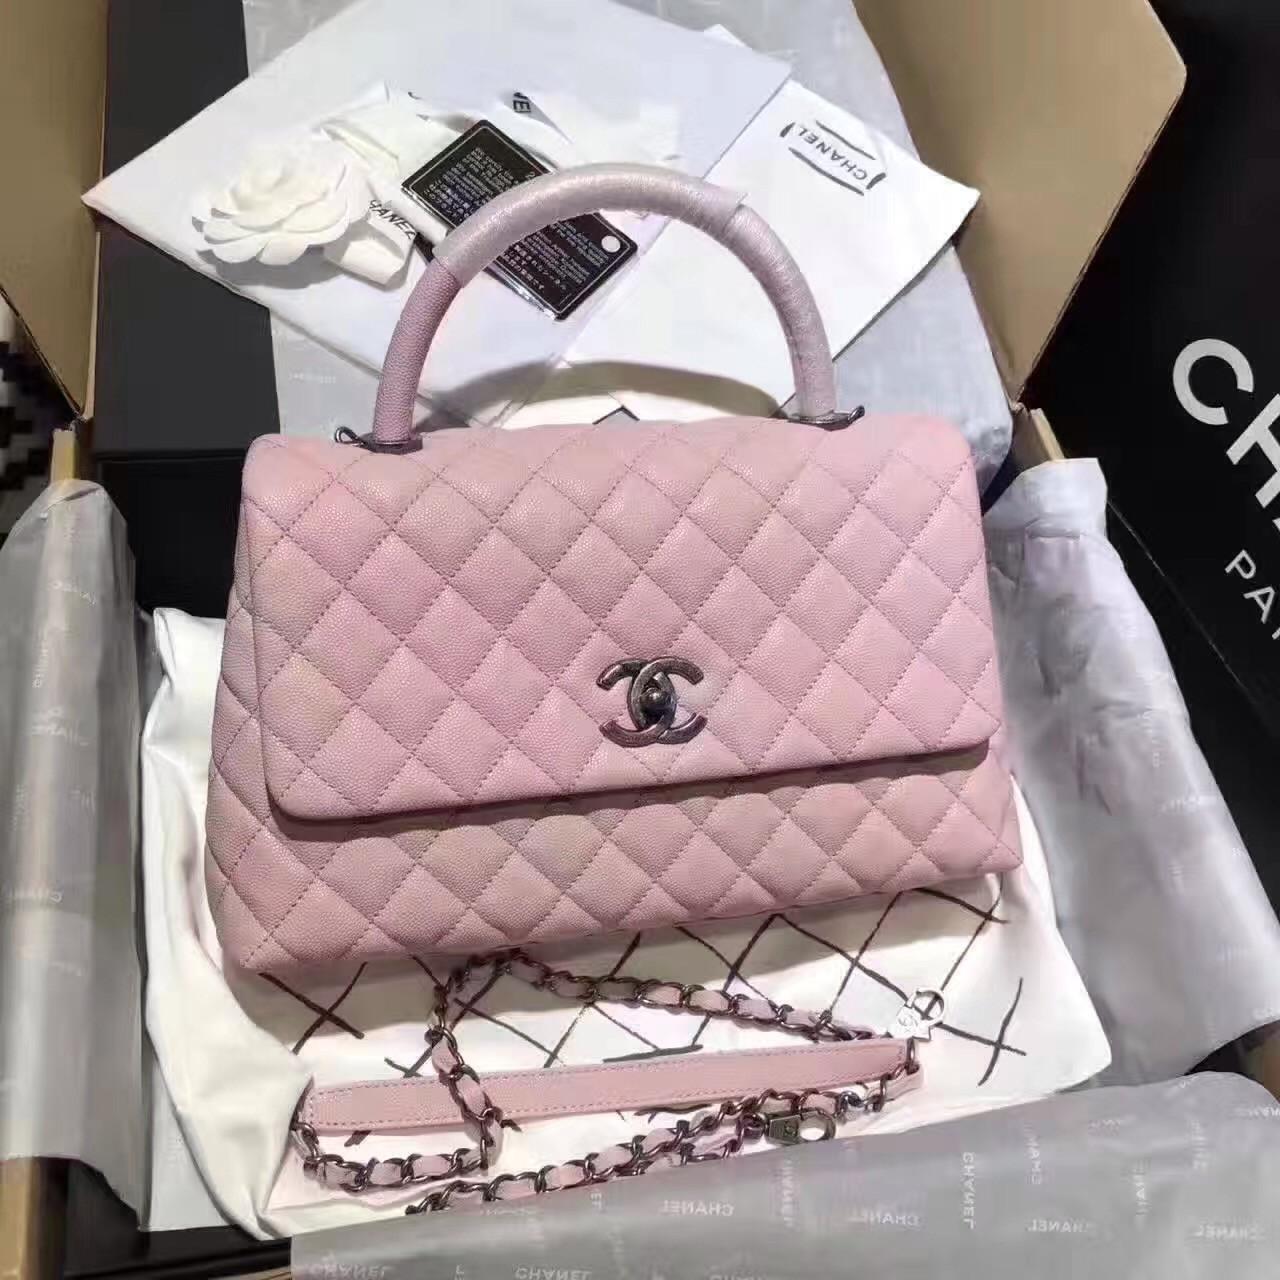 181d1a50c548 Chanel Flap Bag With Top Handle Pink - Bella Vita Moda